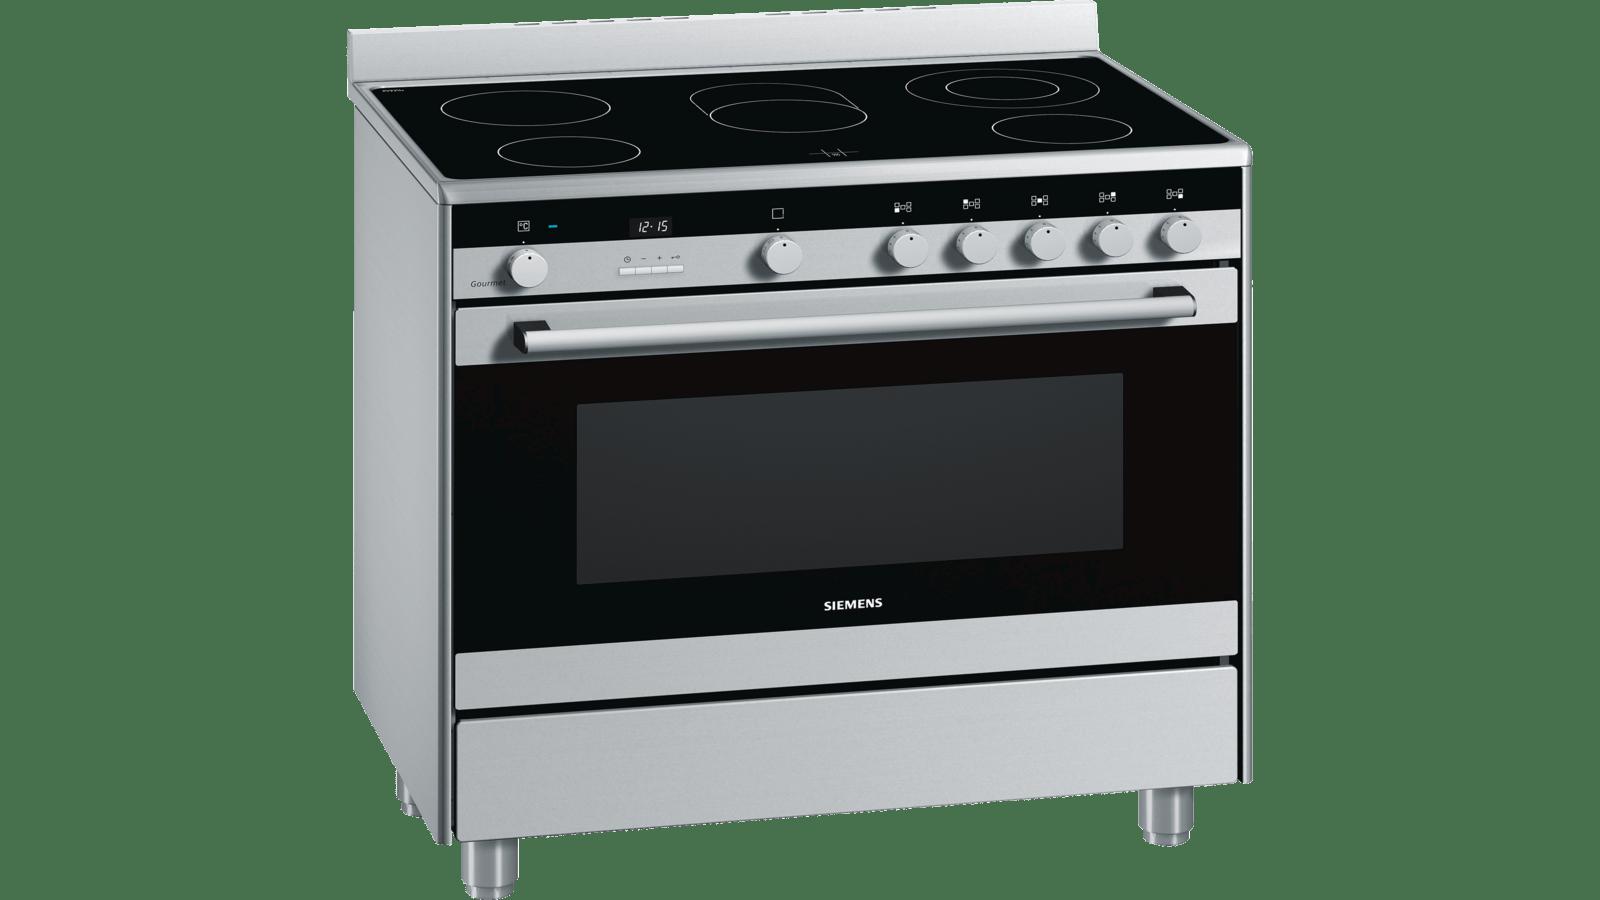 - SIEMENS - HY738356M - Range Cooker 90 Cm